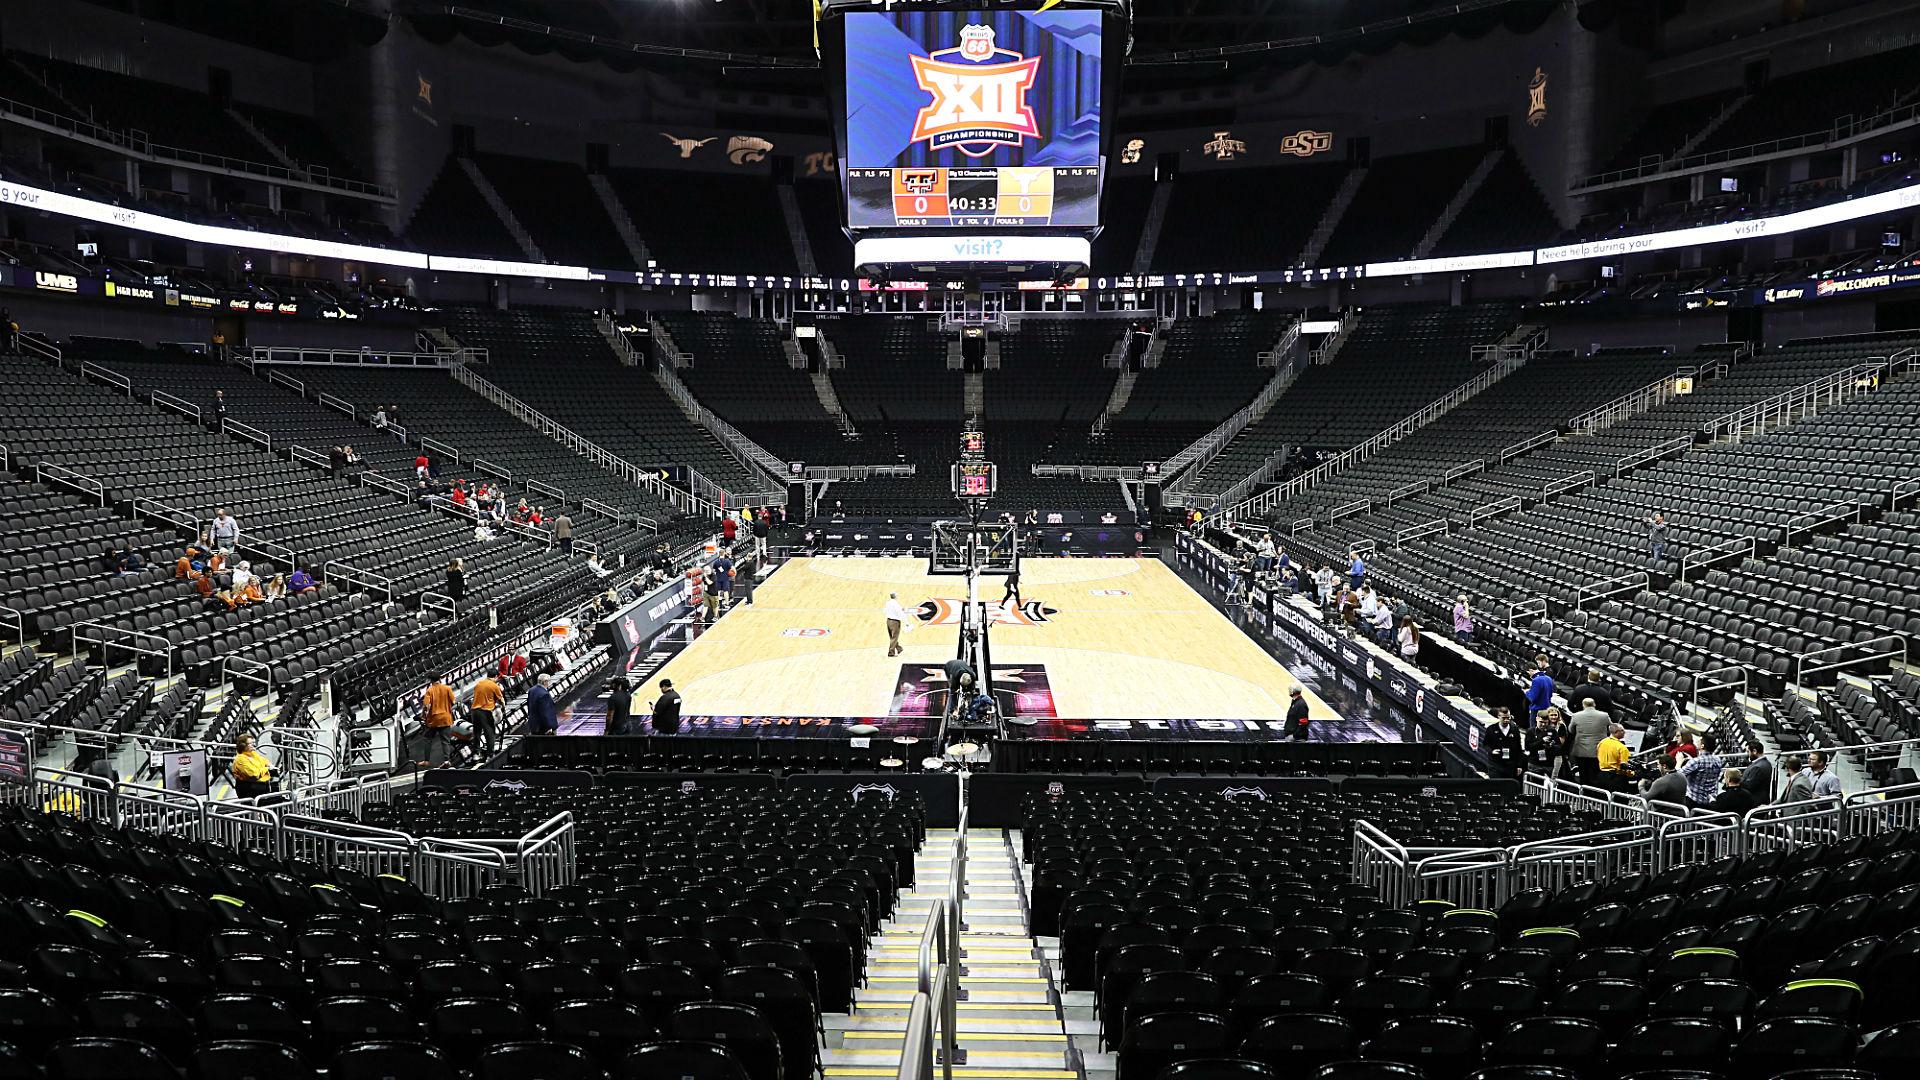 Kansas City Raptors for 20-21 Desperation heave or smart play